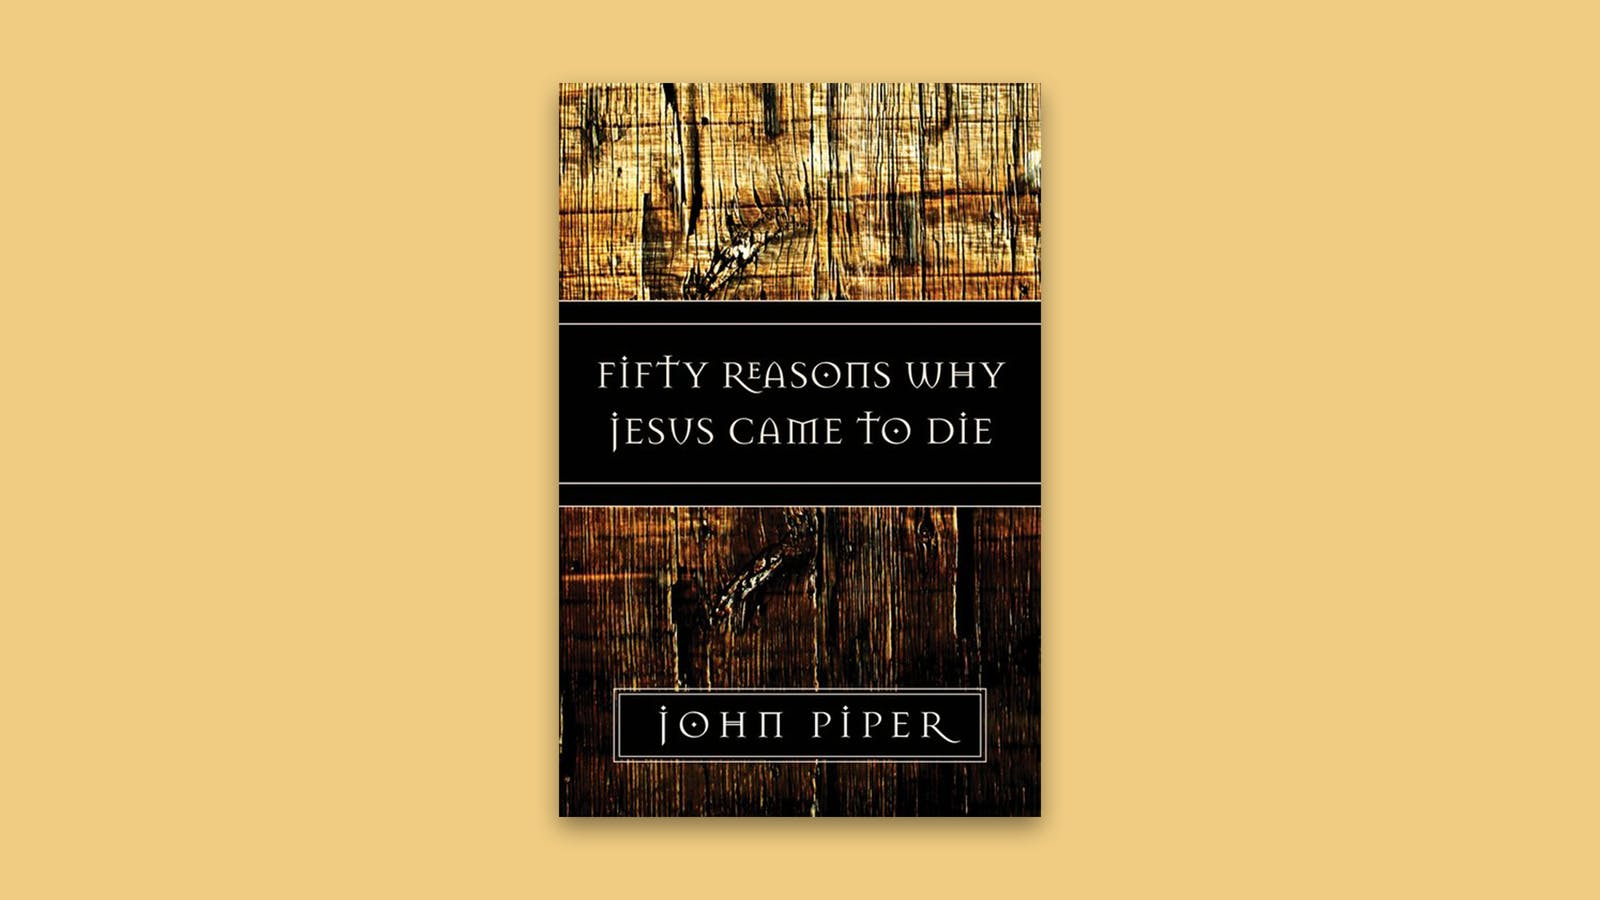 John piper bible study daily